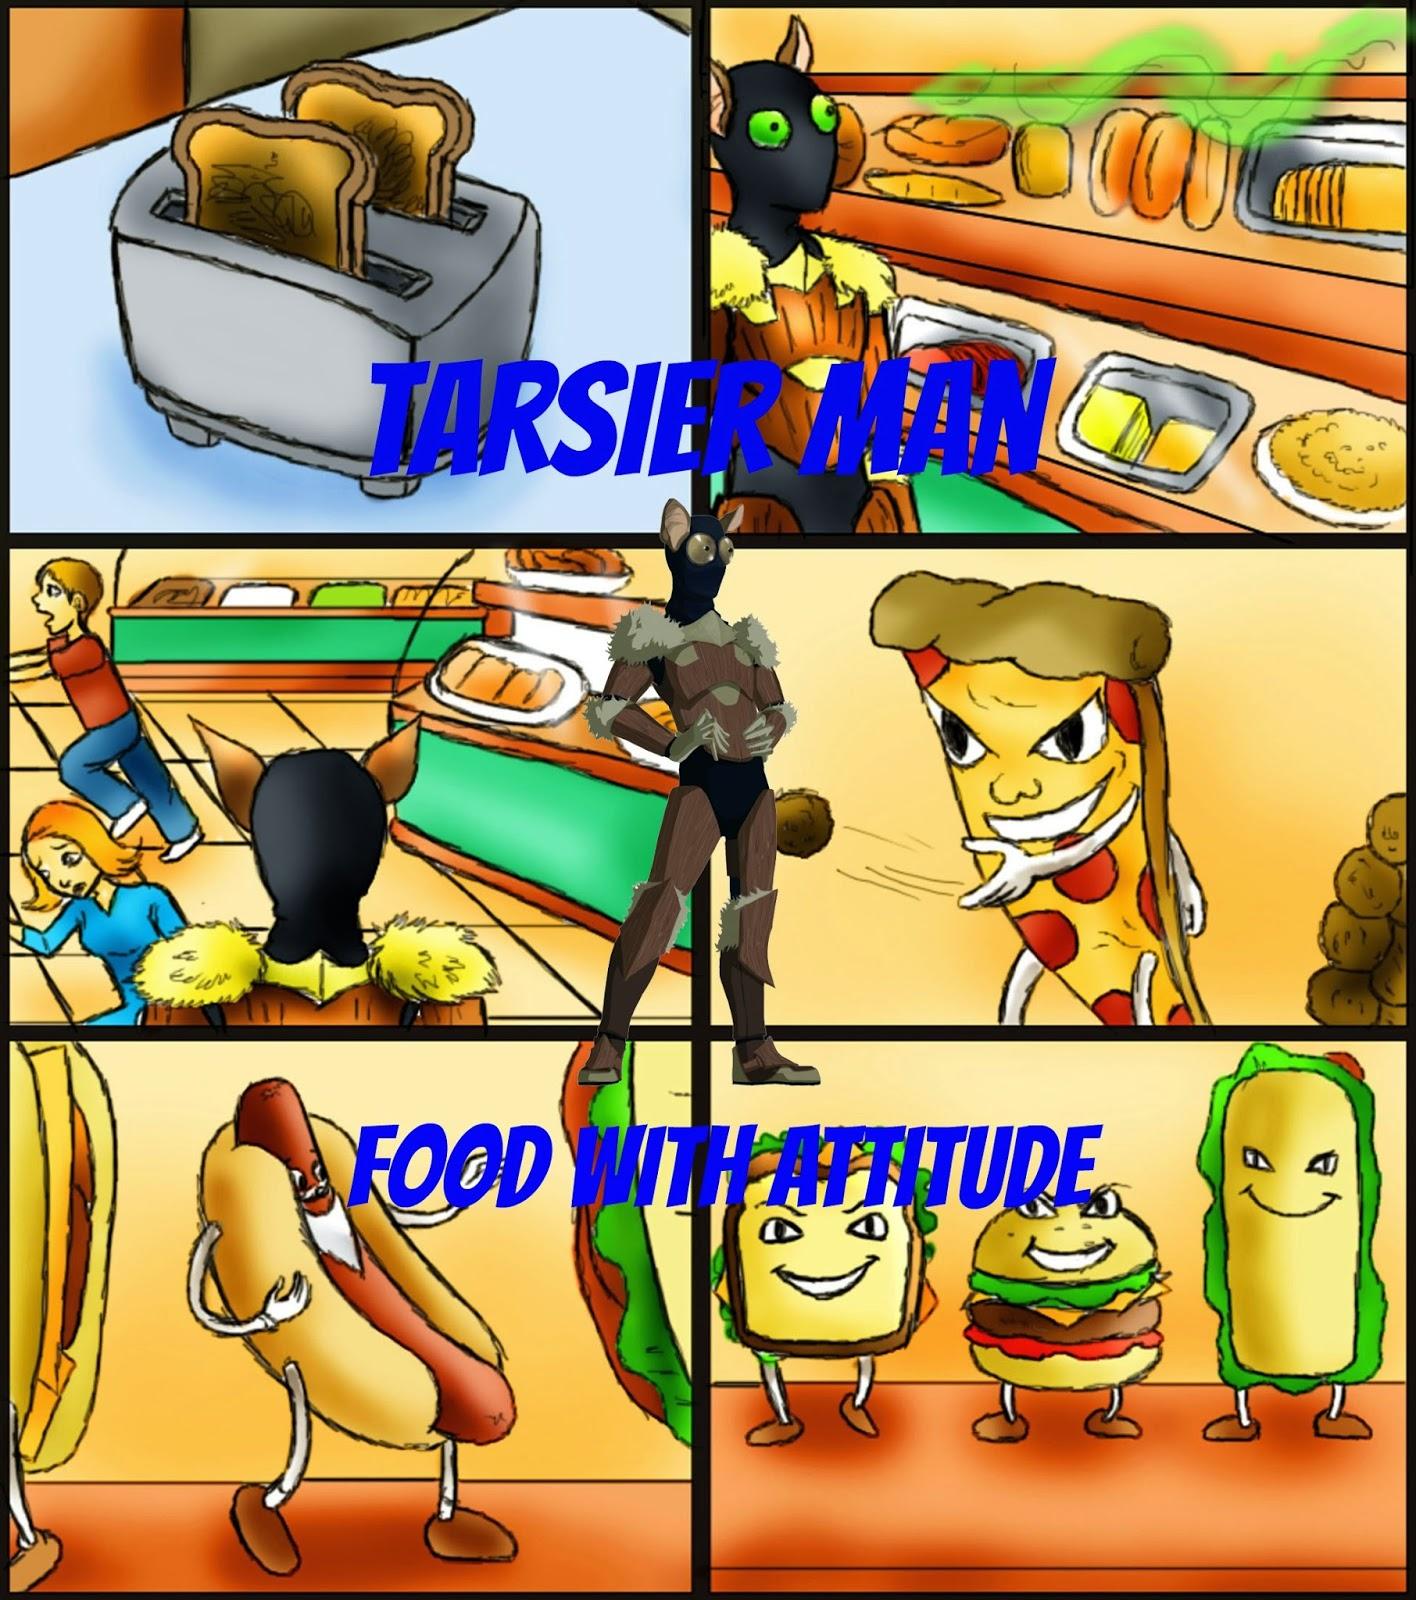 http://www.amazon.com/Tarsier-Man-Attitude-Pat-Hatt-ebook/dp/B00UG8TFMK